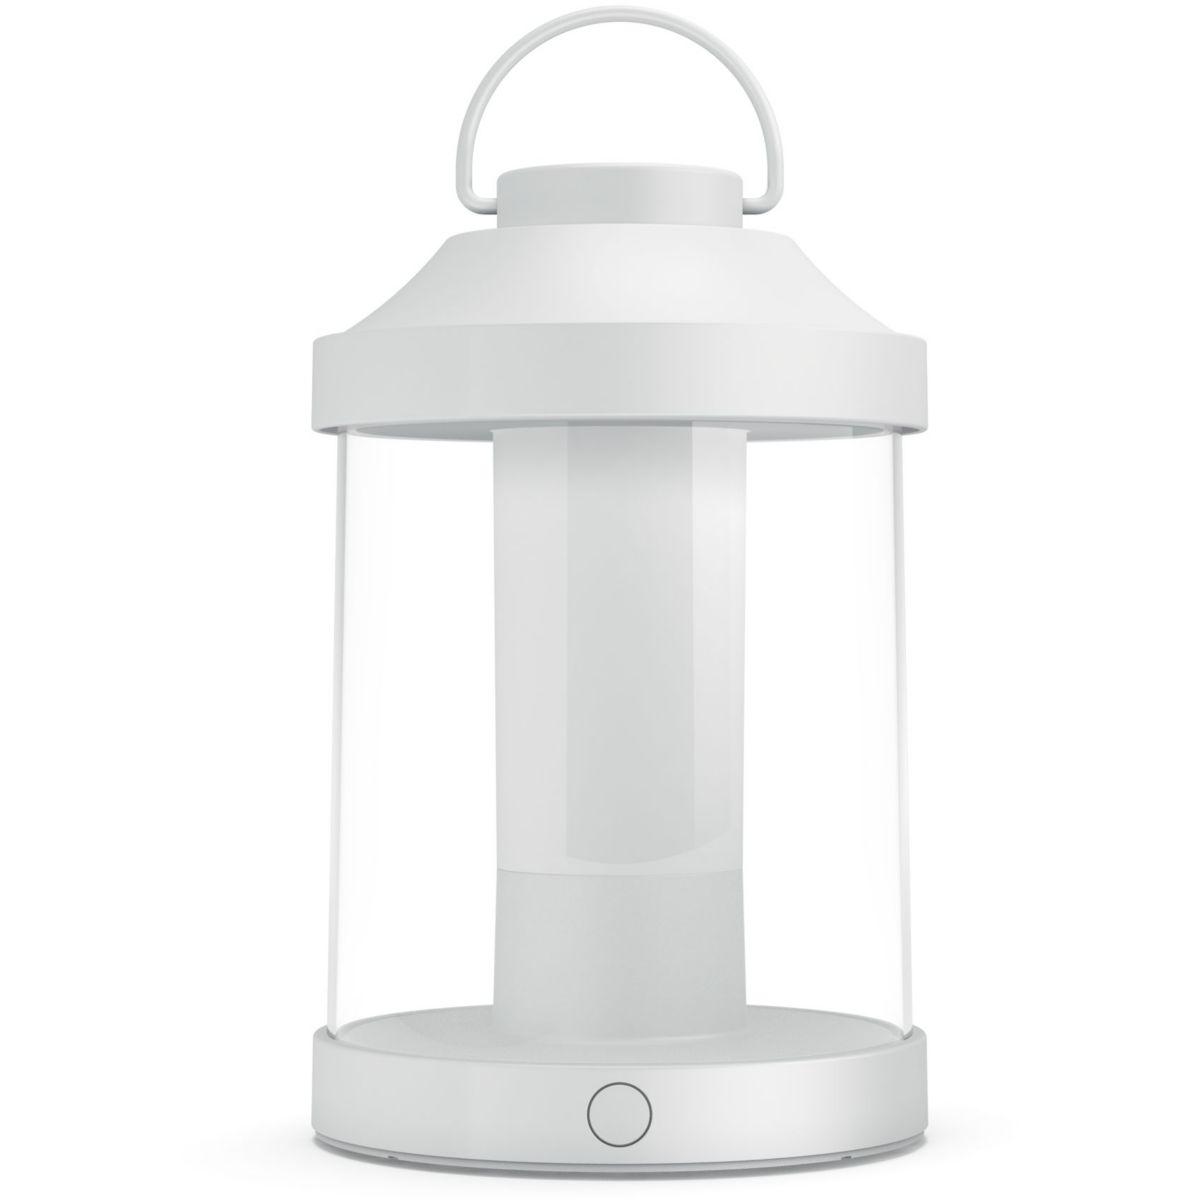 Lanterne PHILIPS portable ABELIA - Blanc